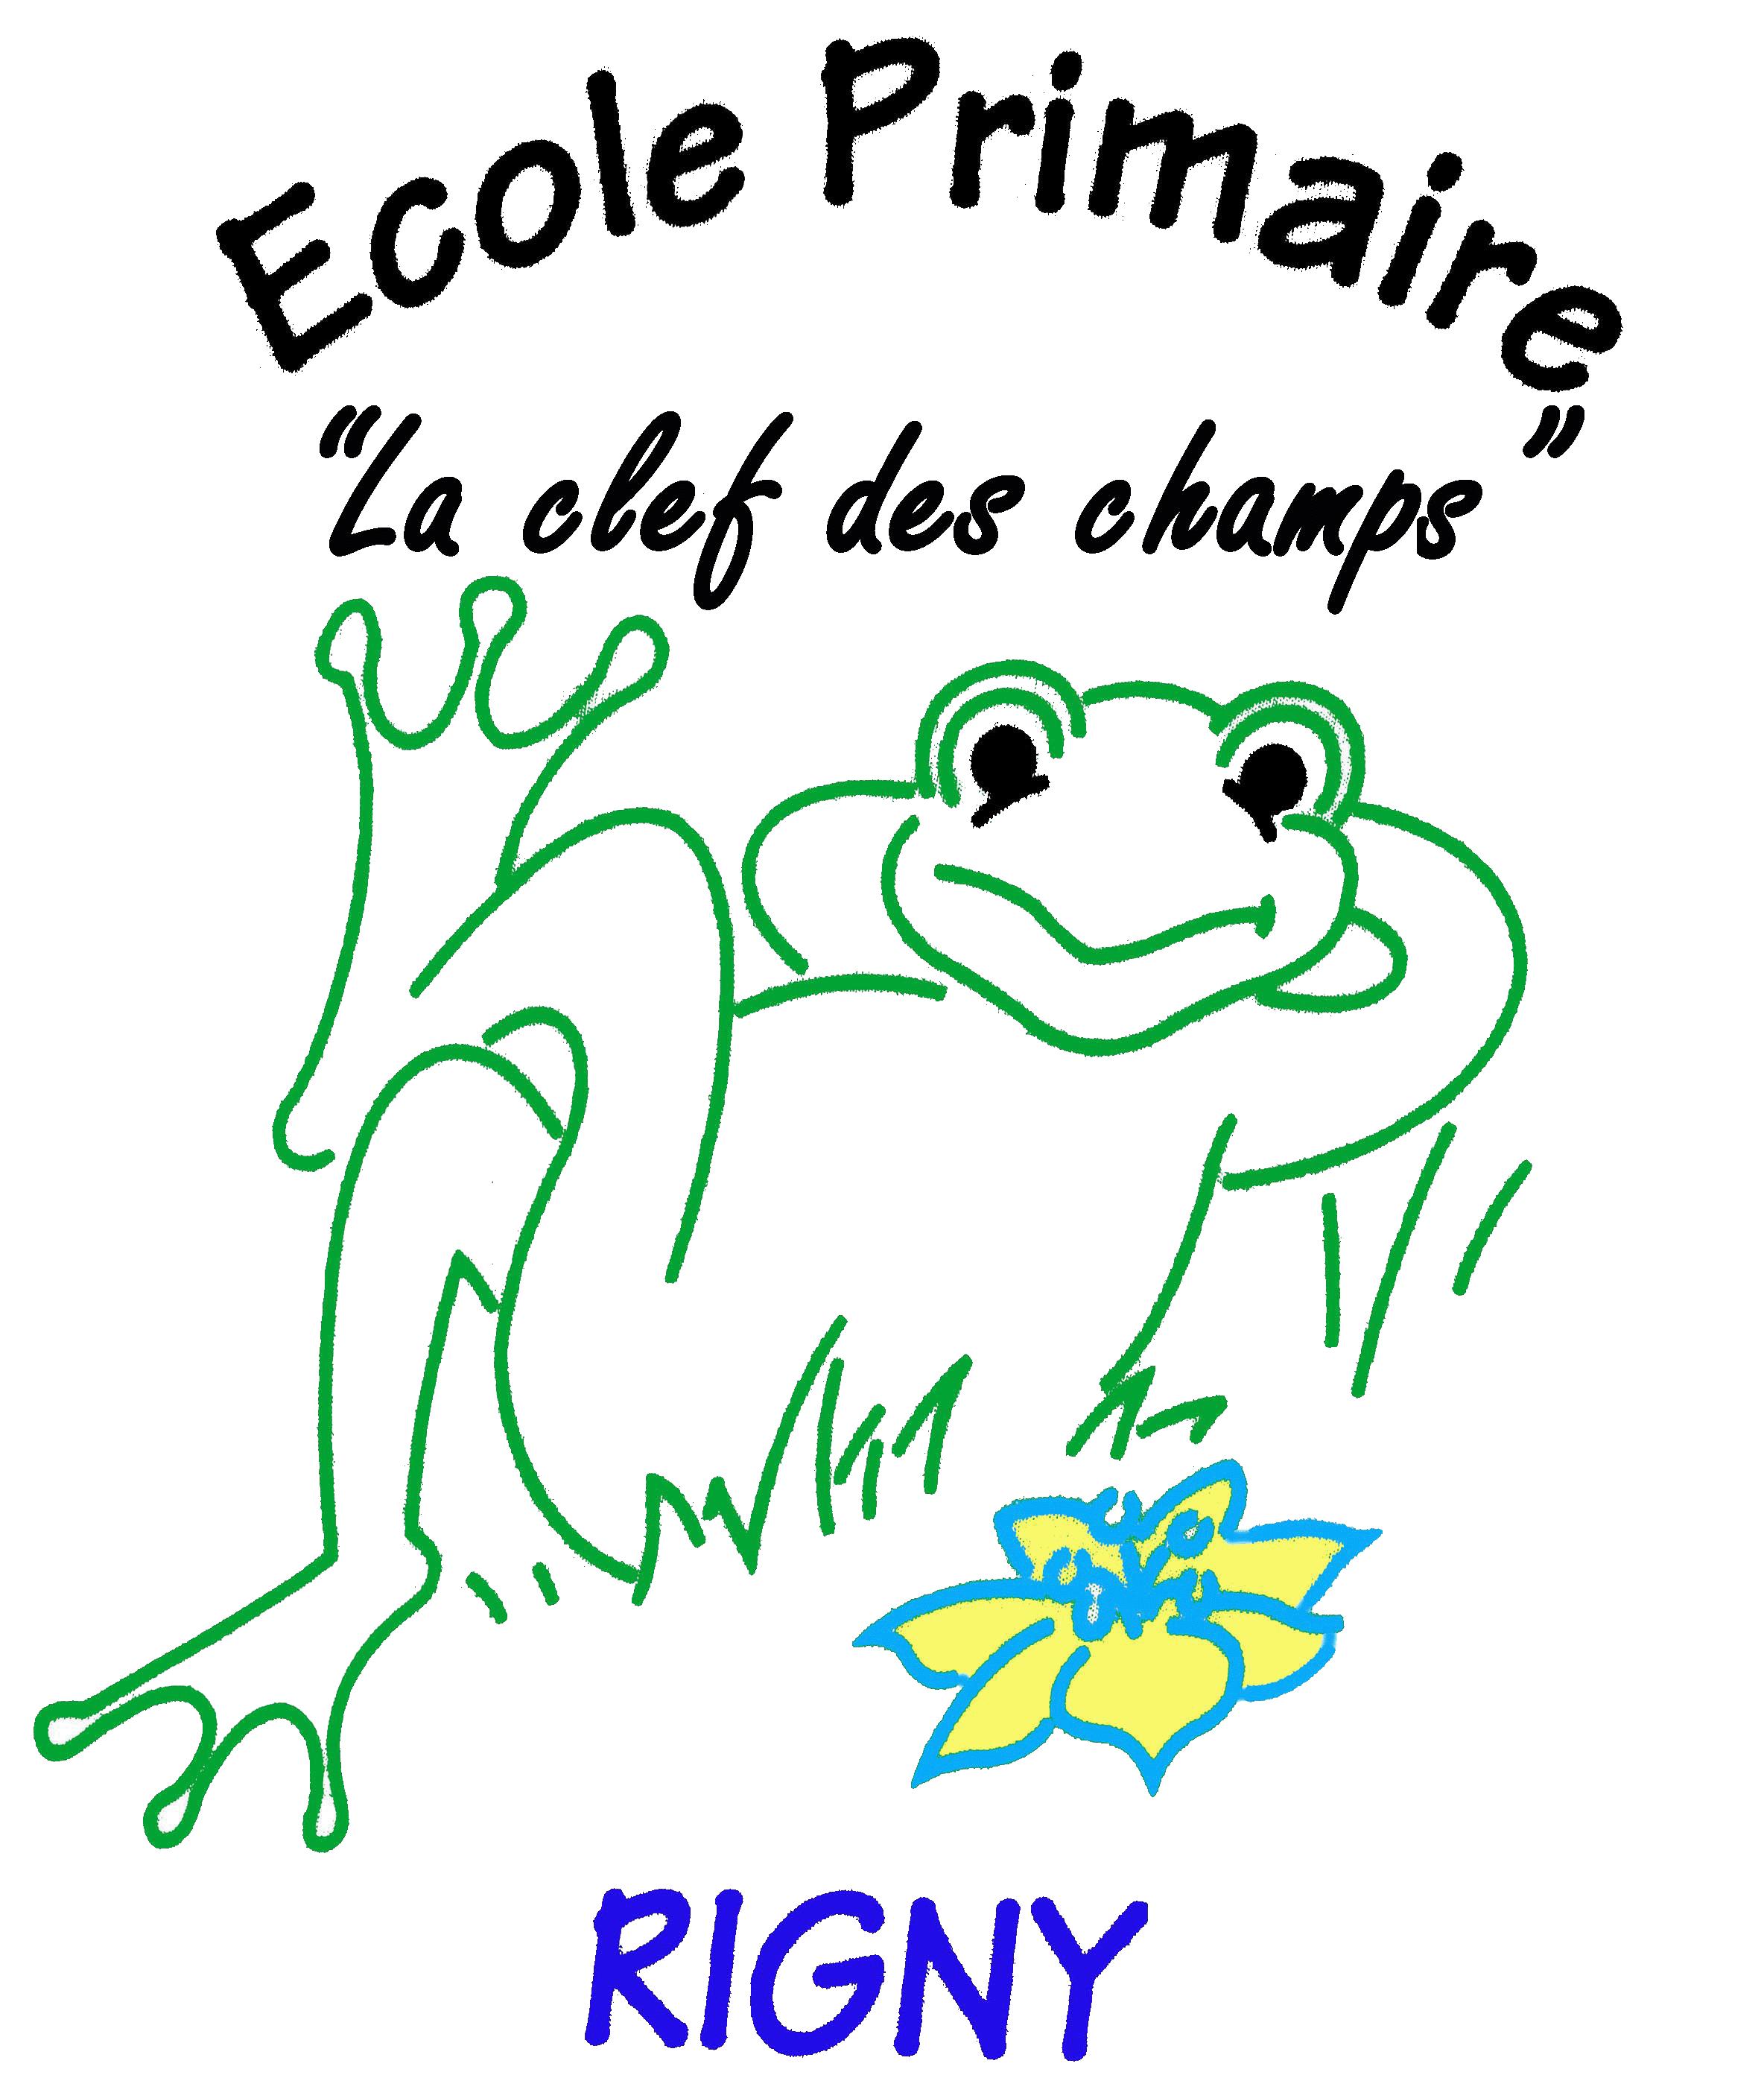 Logo Ecole_Rigny Clef des champs